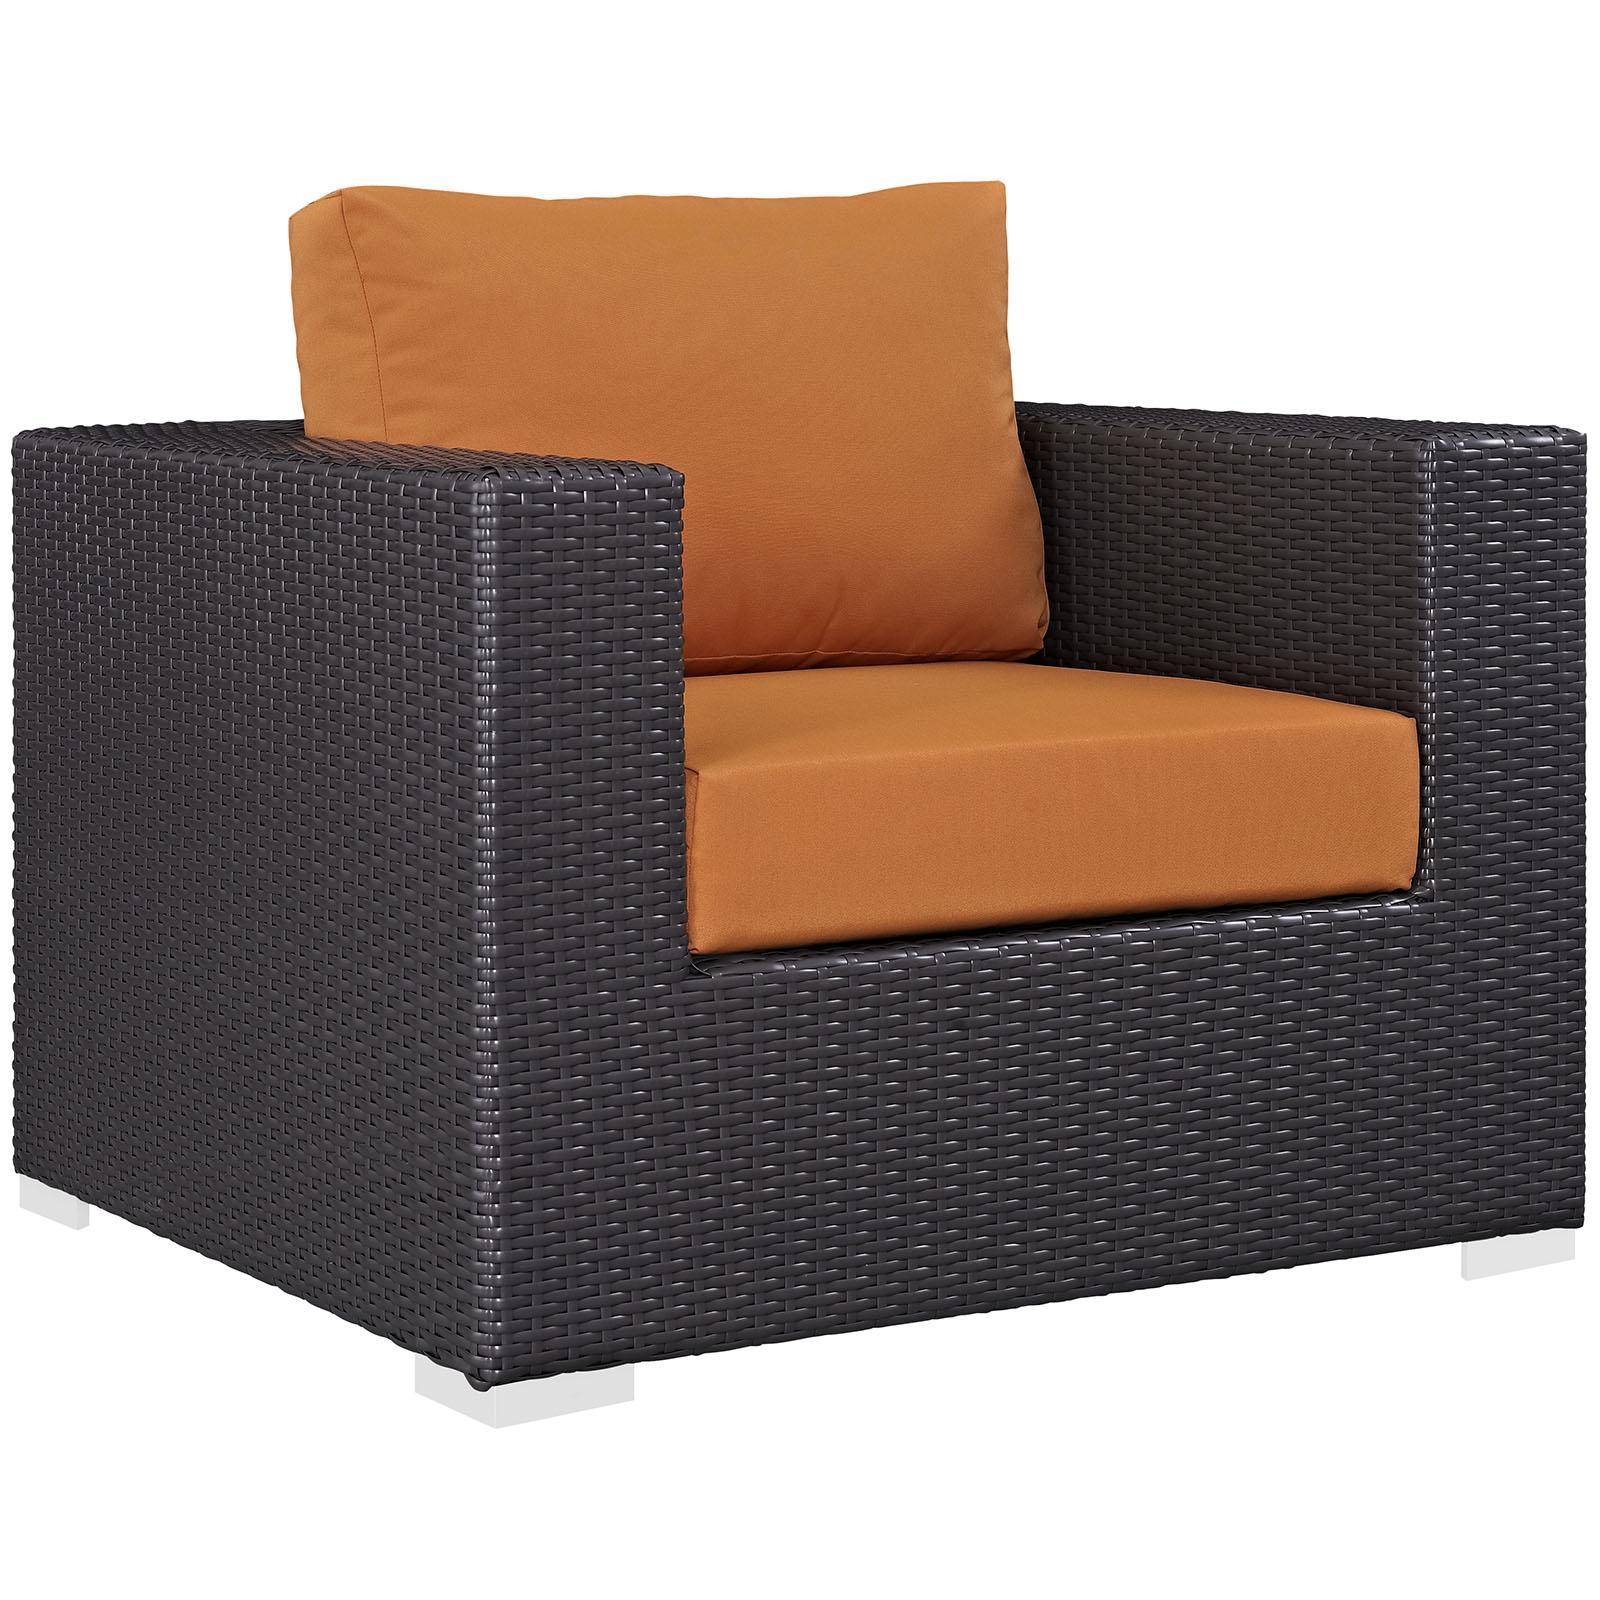 Modern Contemporary Urban Design Outdoor Patio Balcony Lounge Chair, Orange, Rattan